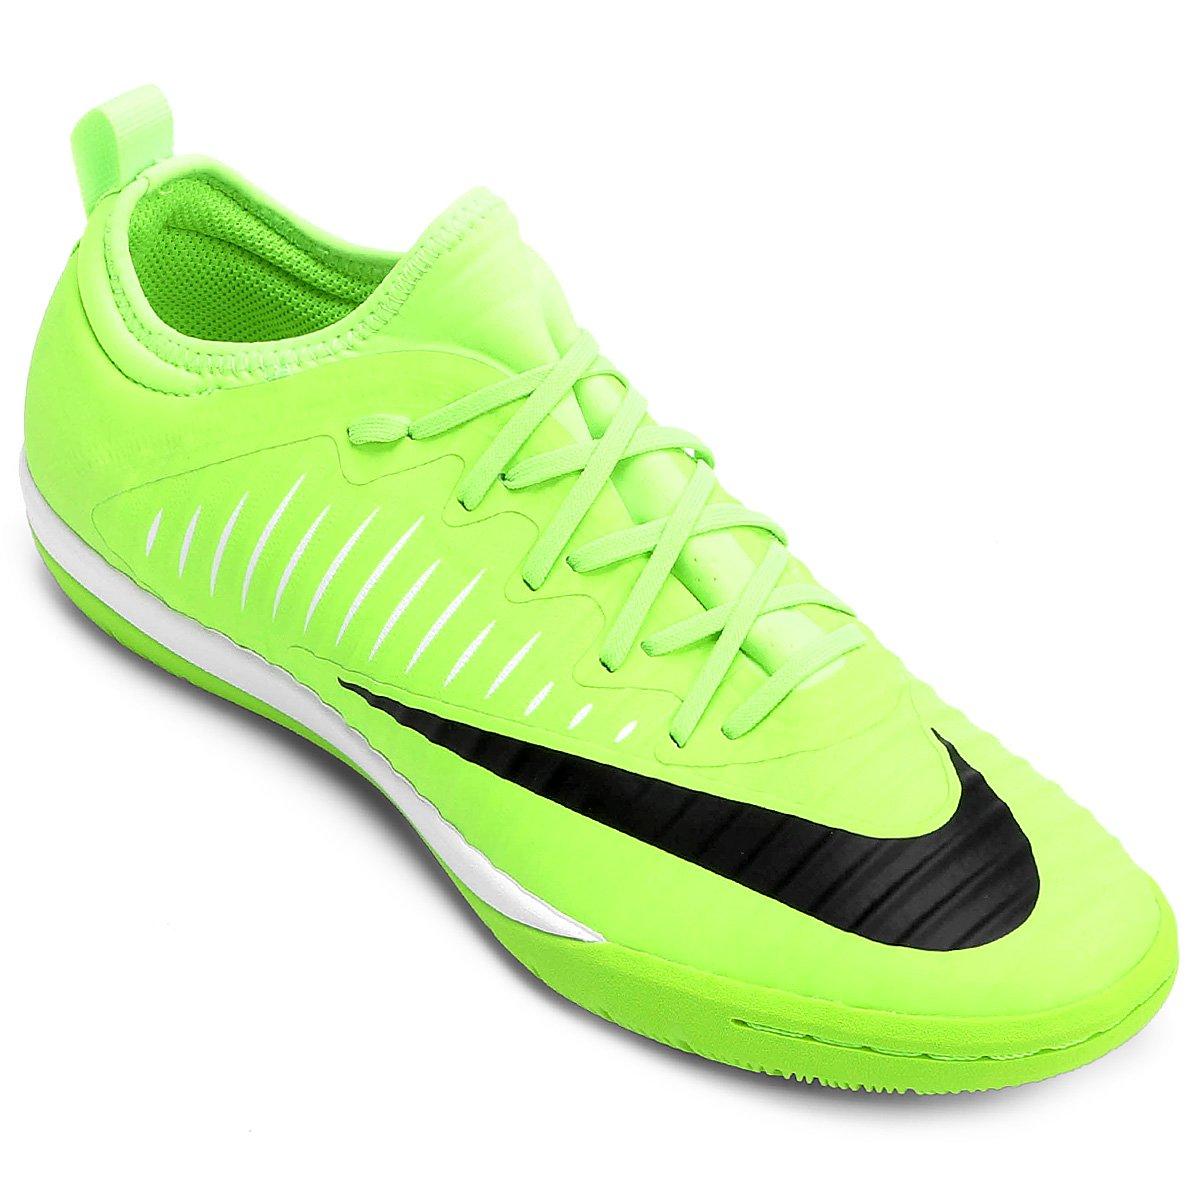 62d538e695e1c Chuteira Futsal Nike Mercurial Finale 2 IC - Compre Agora